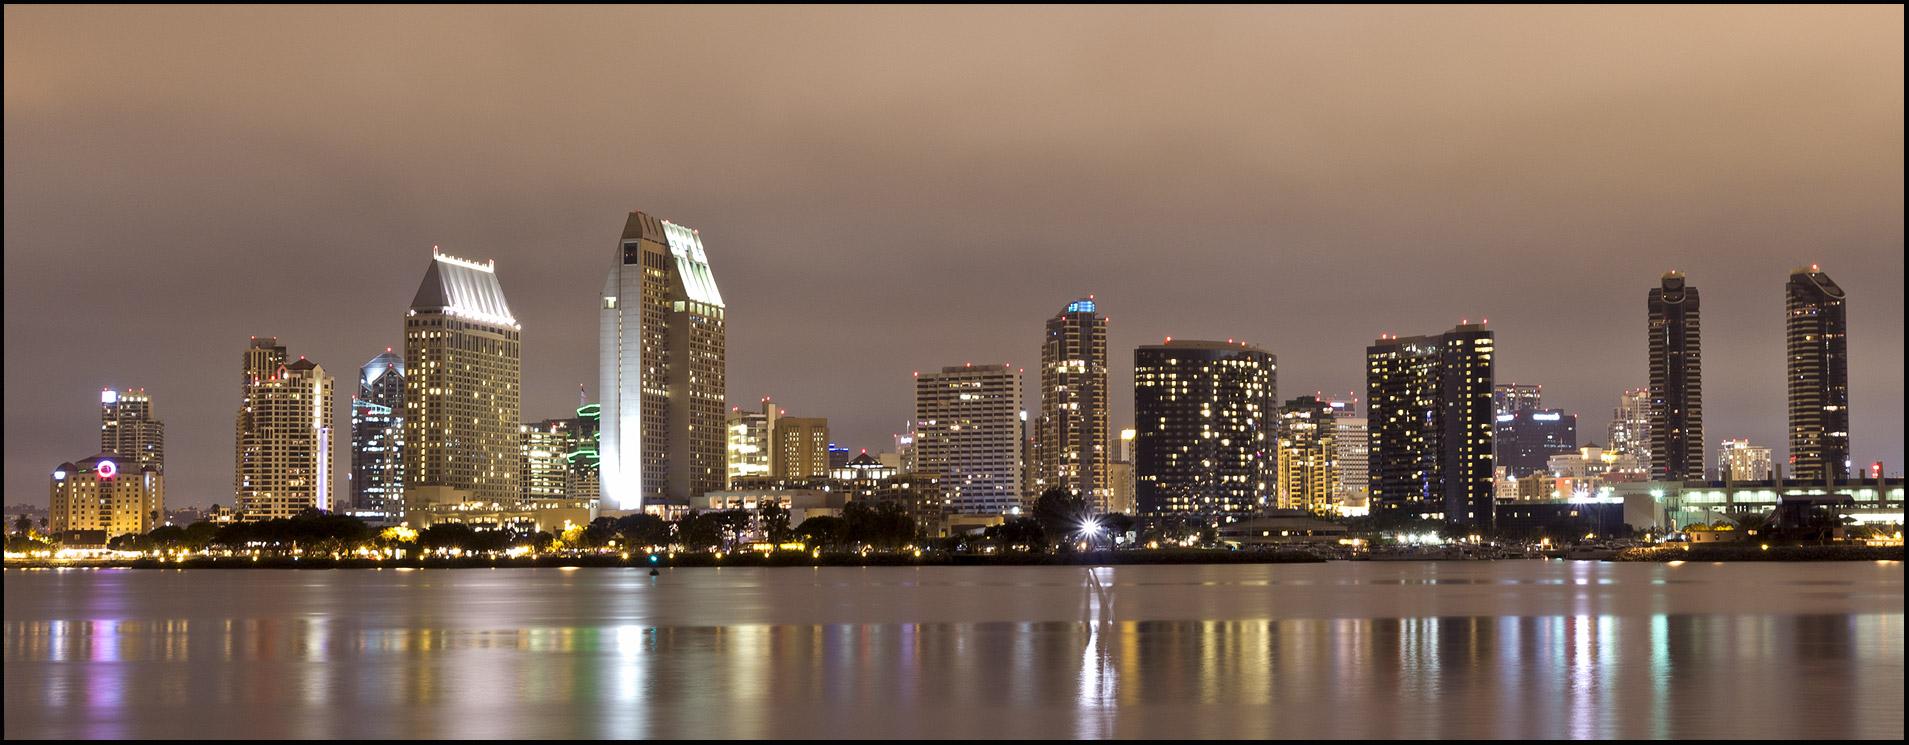 San Diego at night...